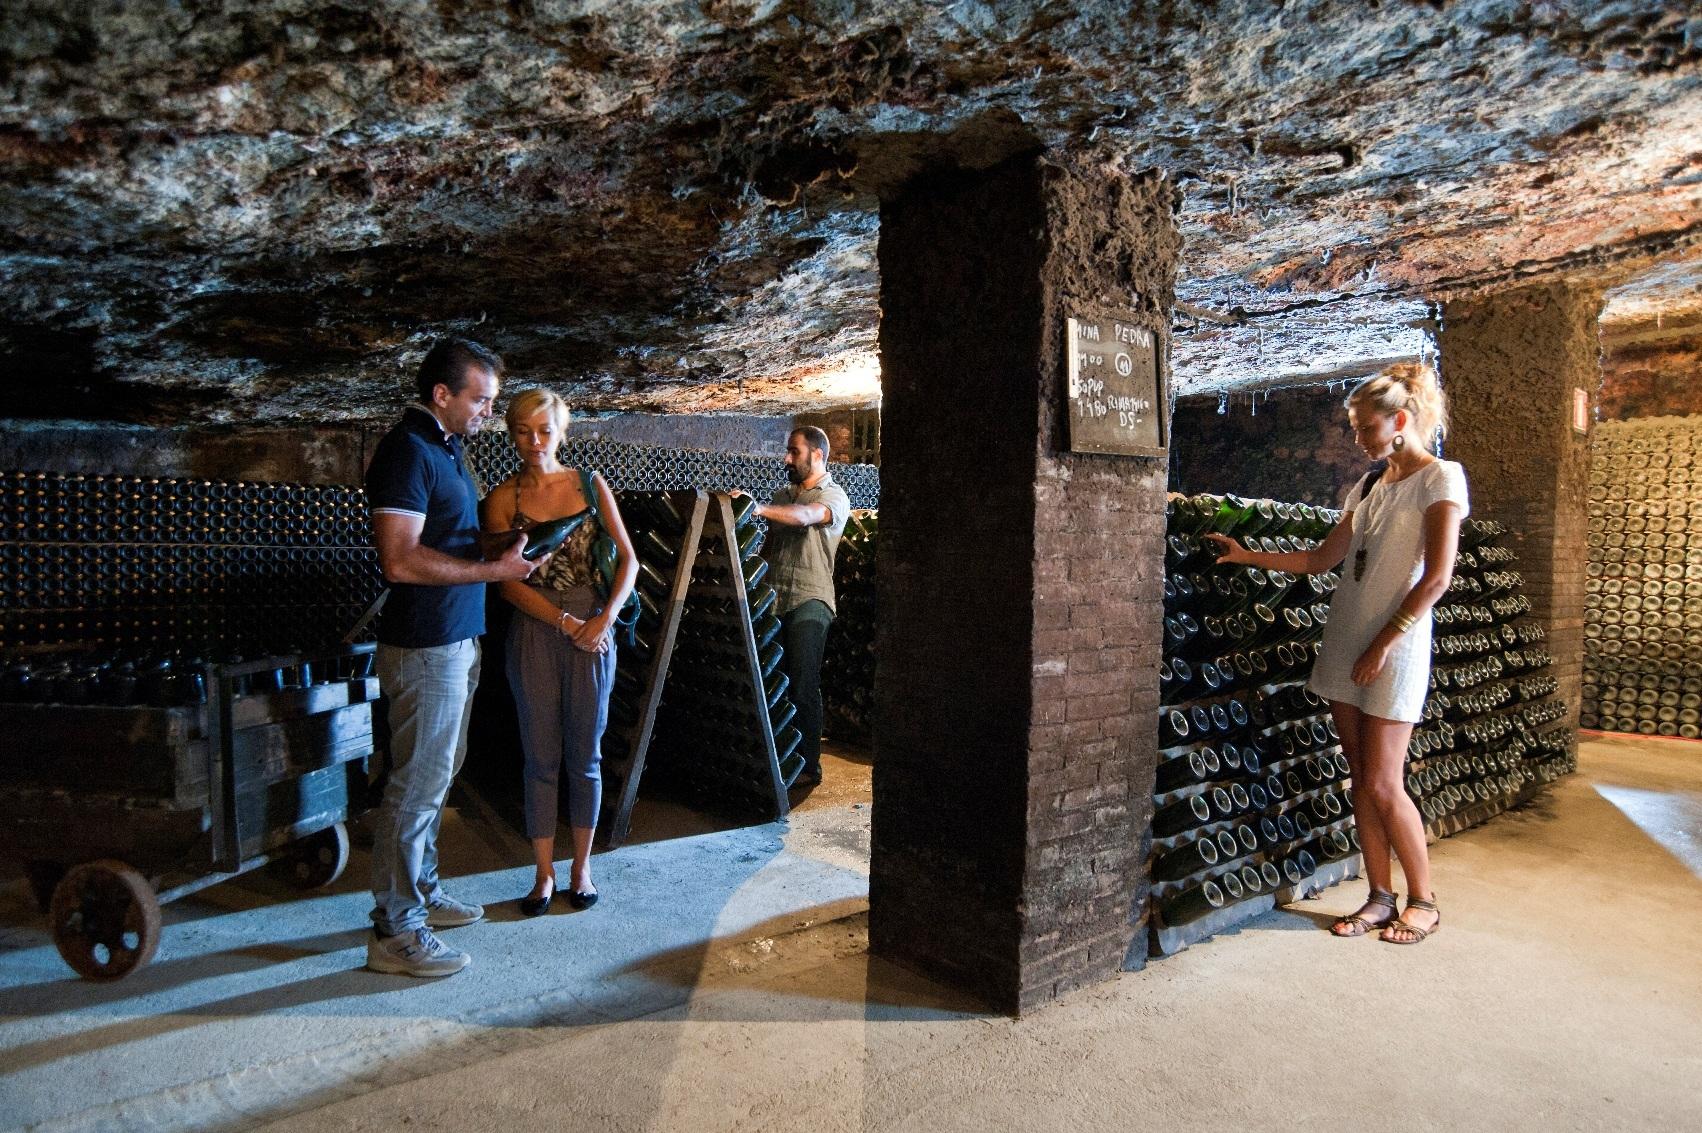 Day 3: Wine museum